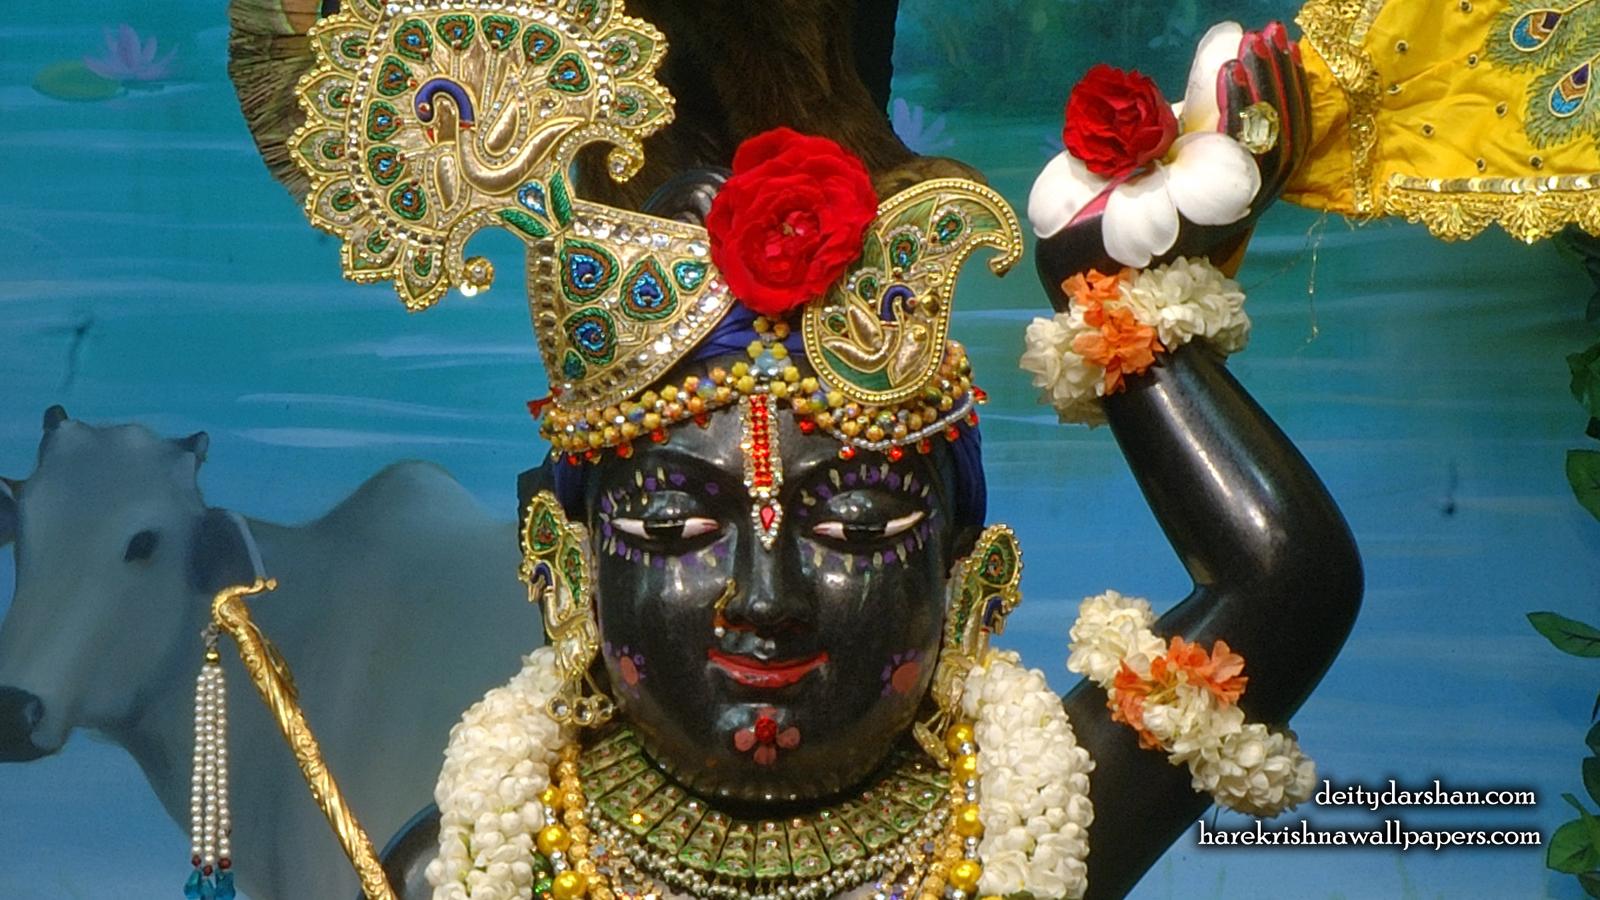 Sri Gopal Close up Wallpaper (060) Size 1600x900 Download